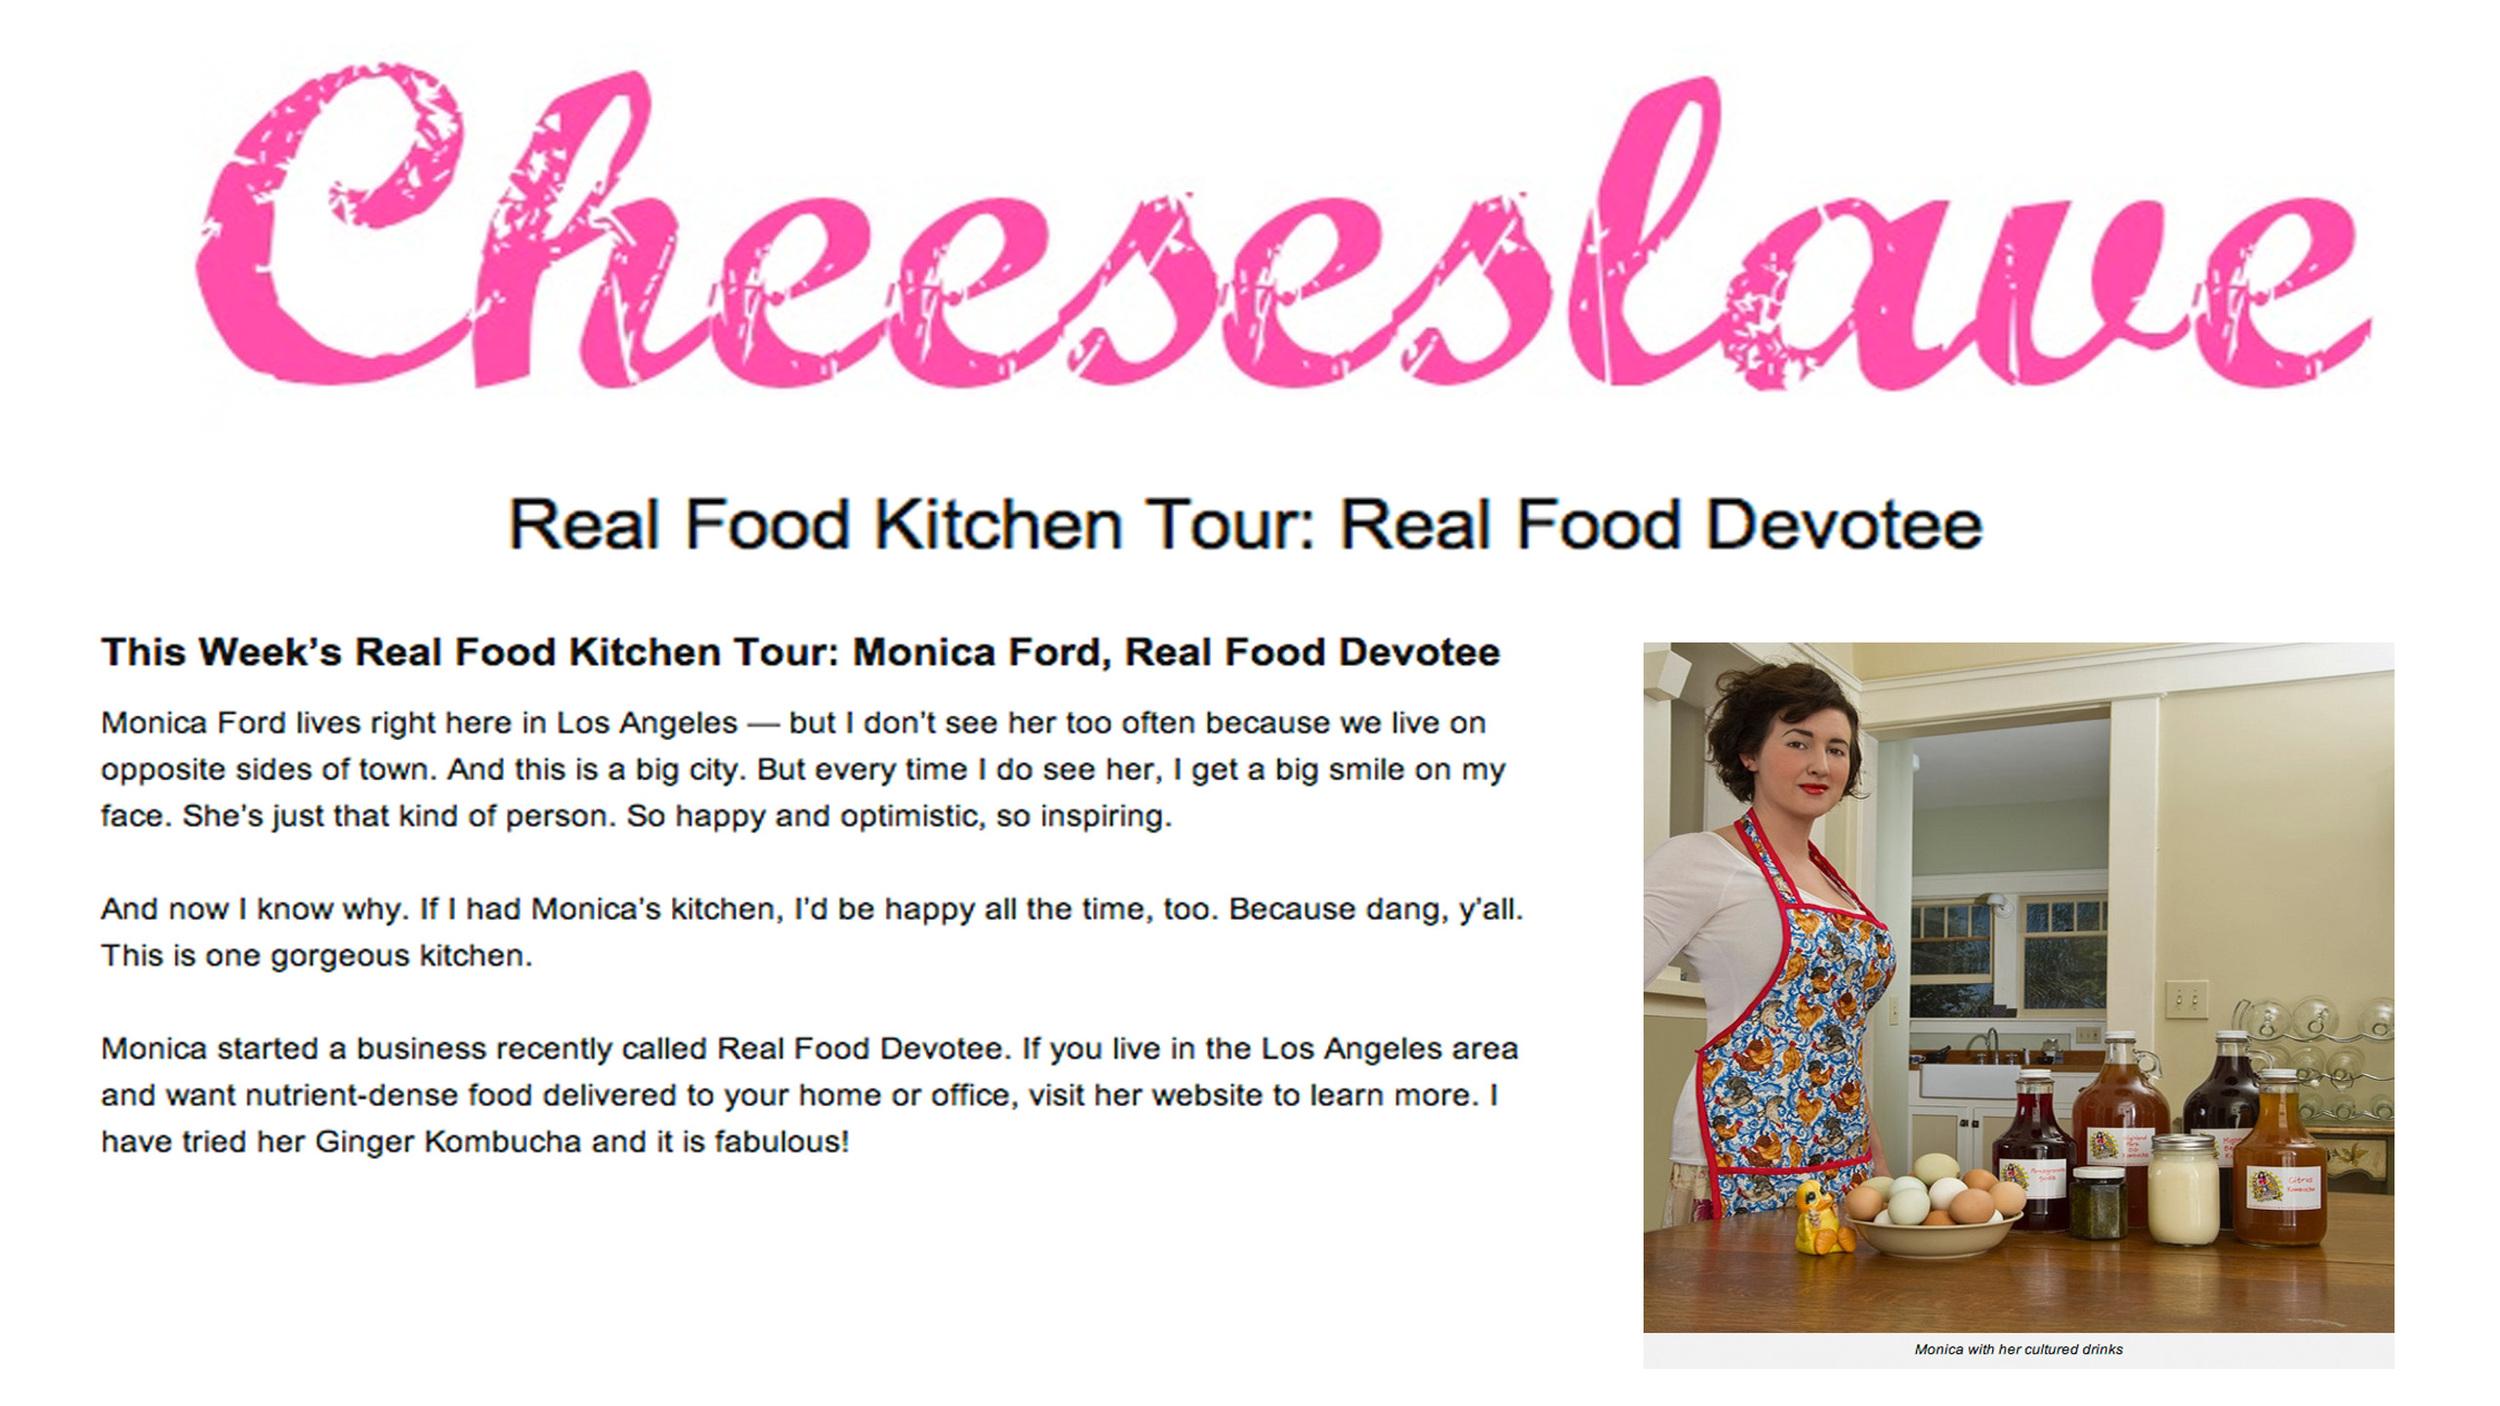 010 CheeseSlaveRFDtour.jpg